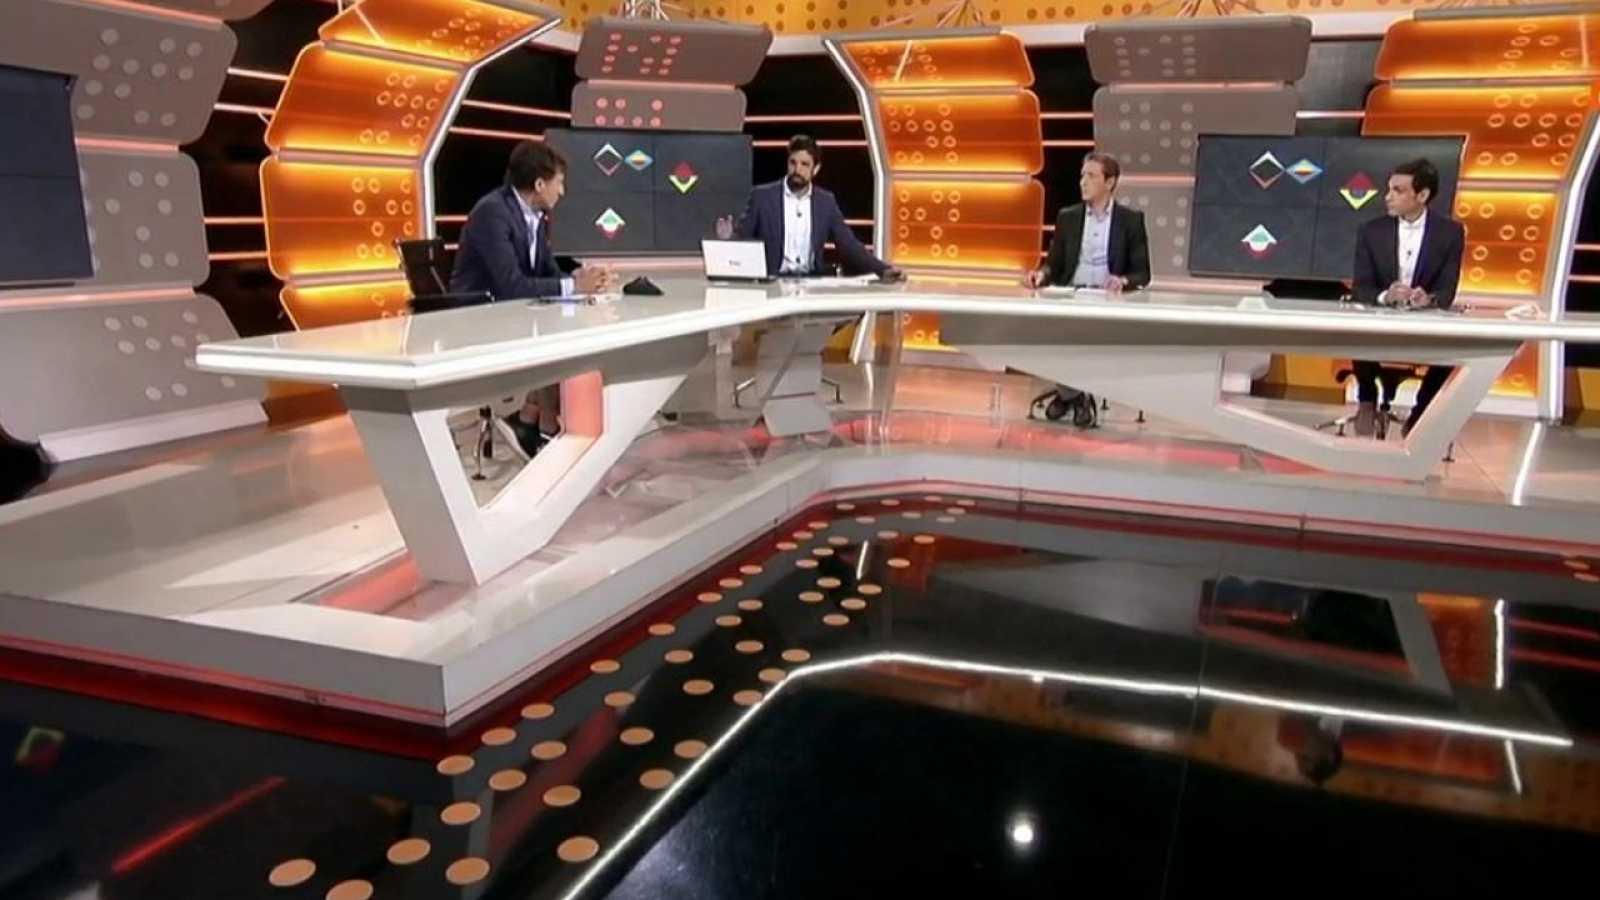 Fútbol - UEFA National League 2020 - Previo partido Ucrania-España - ver ahora